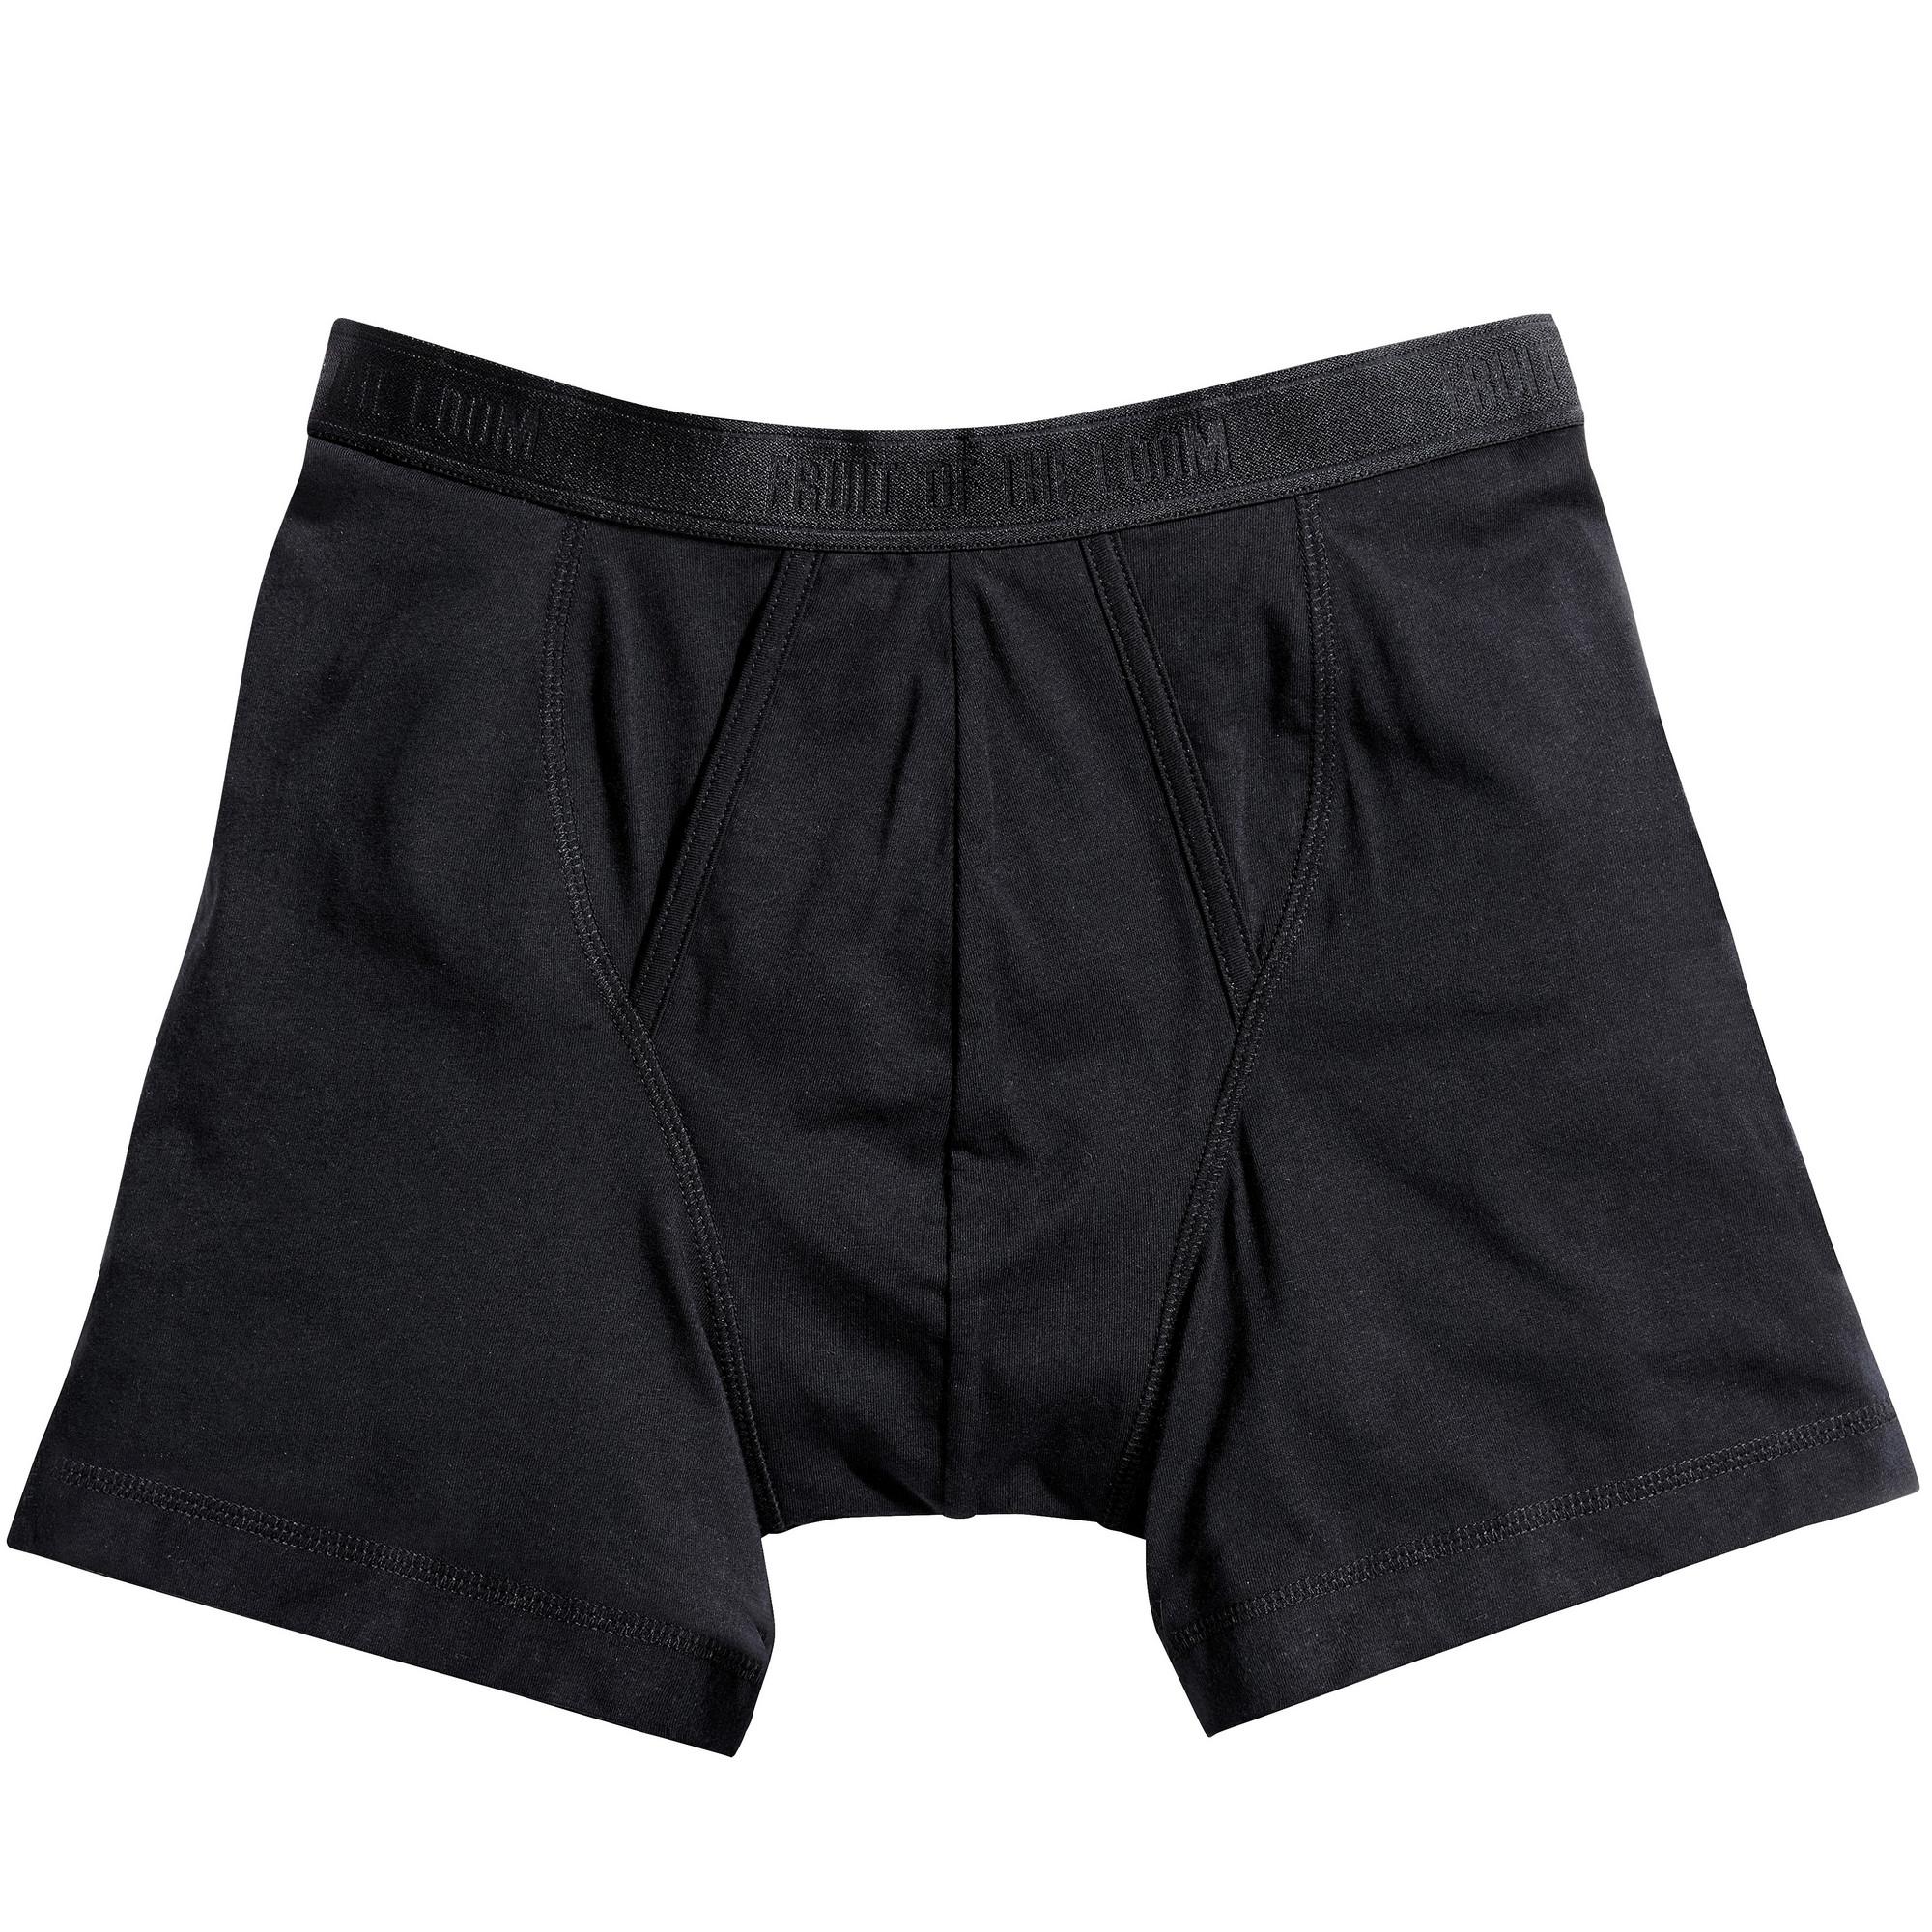 miniature 9 - Fruit-Of-The-Loom-Lot-de-2-boxers-Homme-BC3358